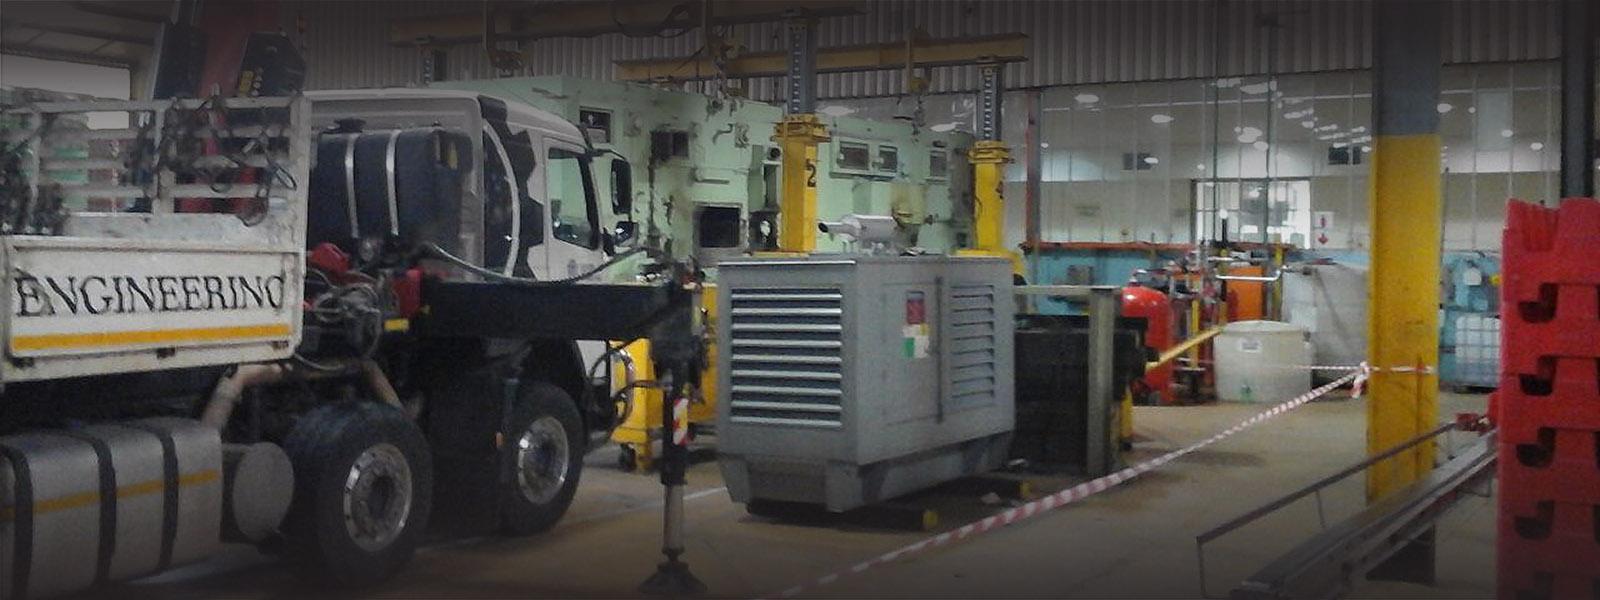 heavy-lifting-division-projects-MME-machine-moving-engineering-equipment-Gauteng-KwaZulu-Natal-ZA